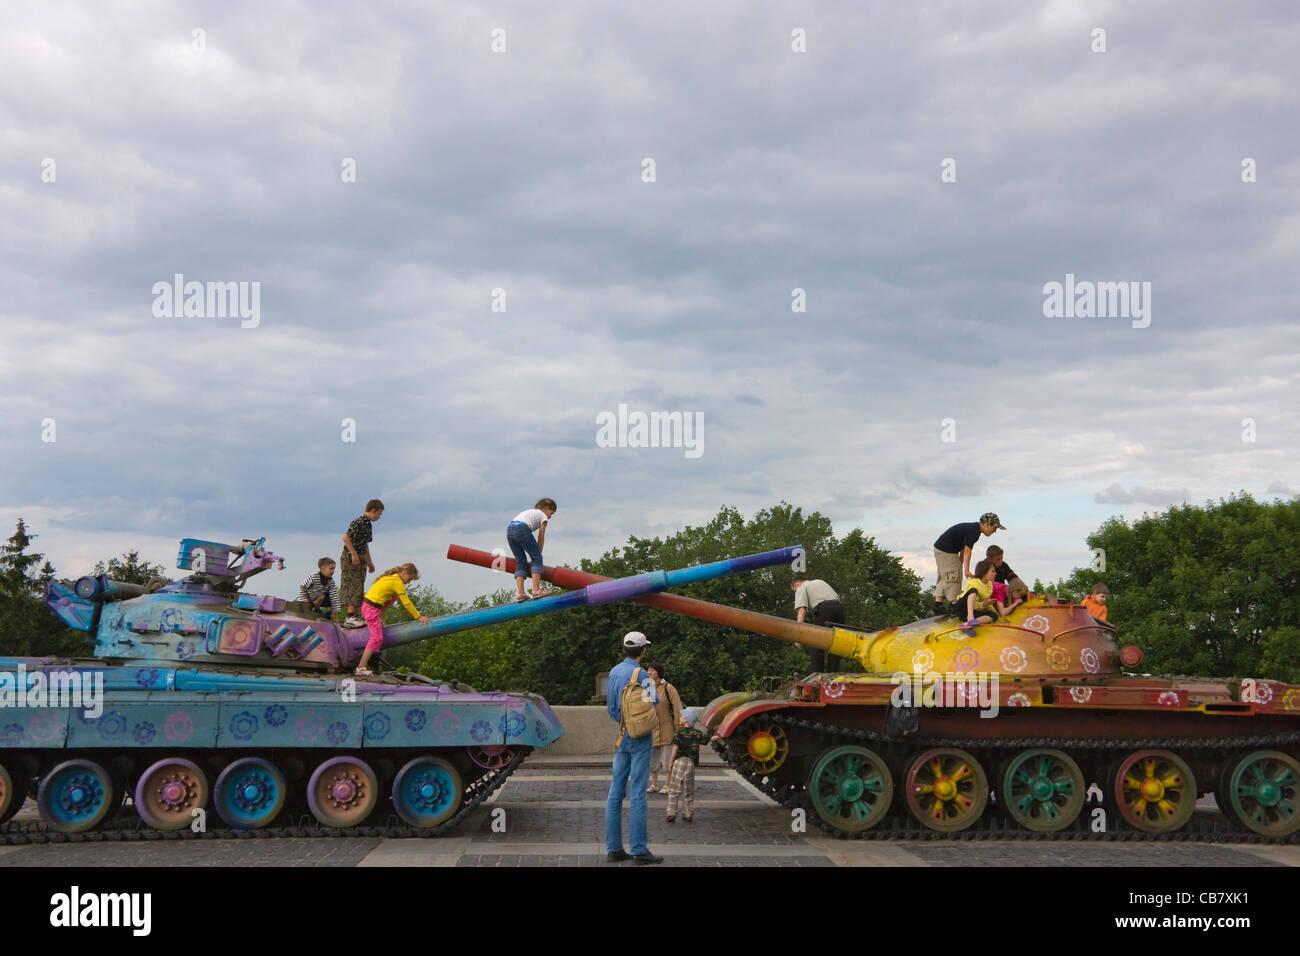 Tanks in Museum of the Great Patriotic War, Kiev, Ukraine - Stock Image